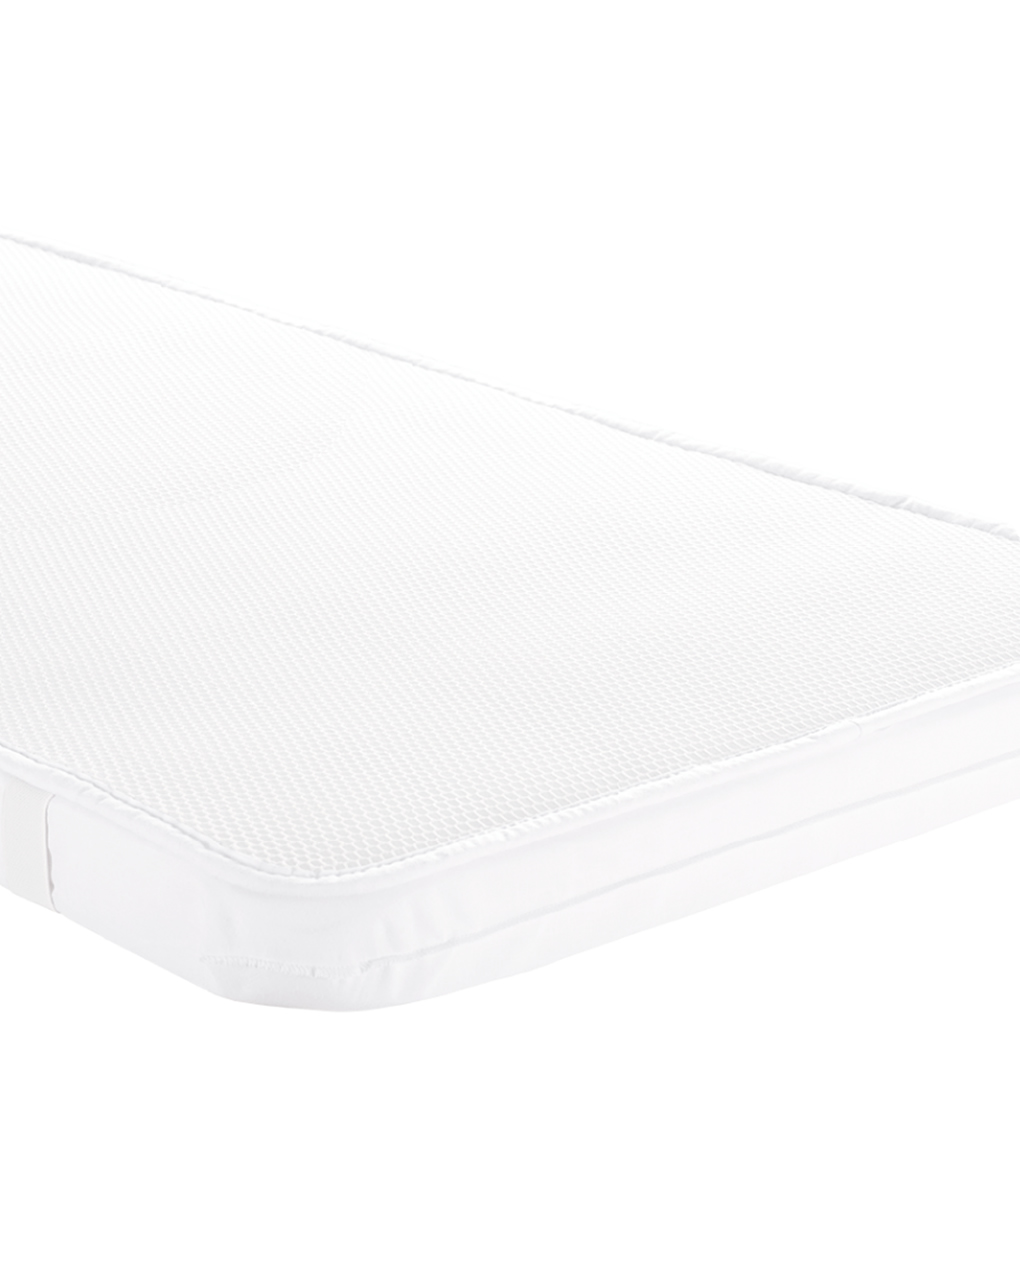 AirCuddle Στρώμα+Κάλλυμα στρώματος Top Safe για λίκνο 76×48 cm